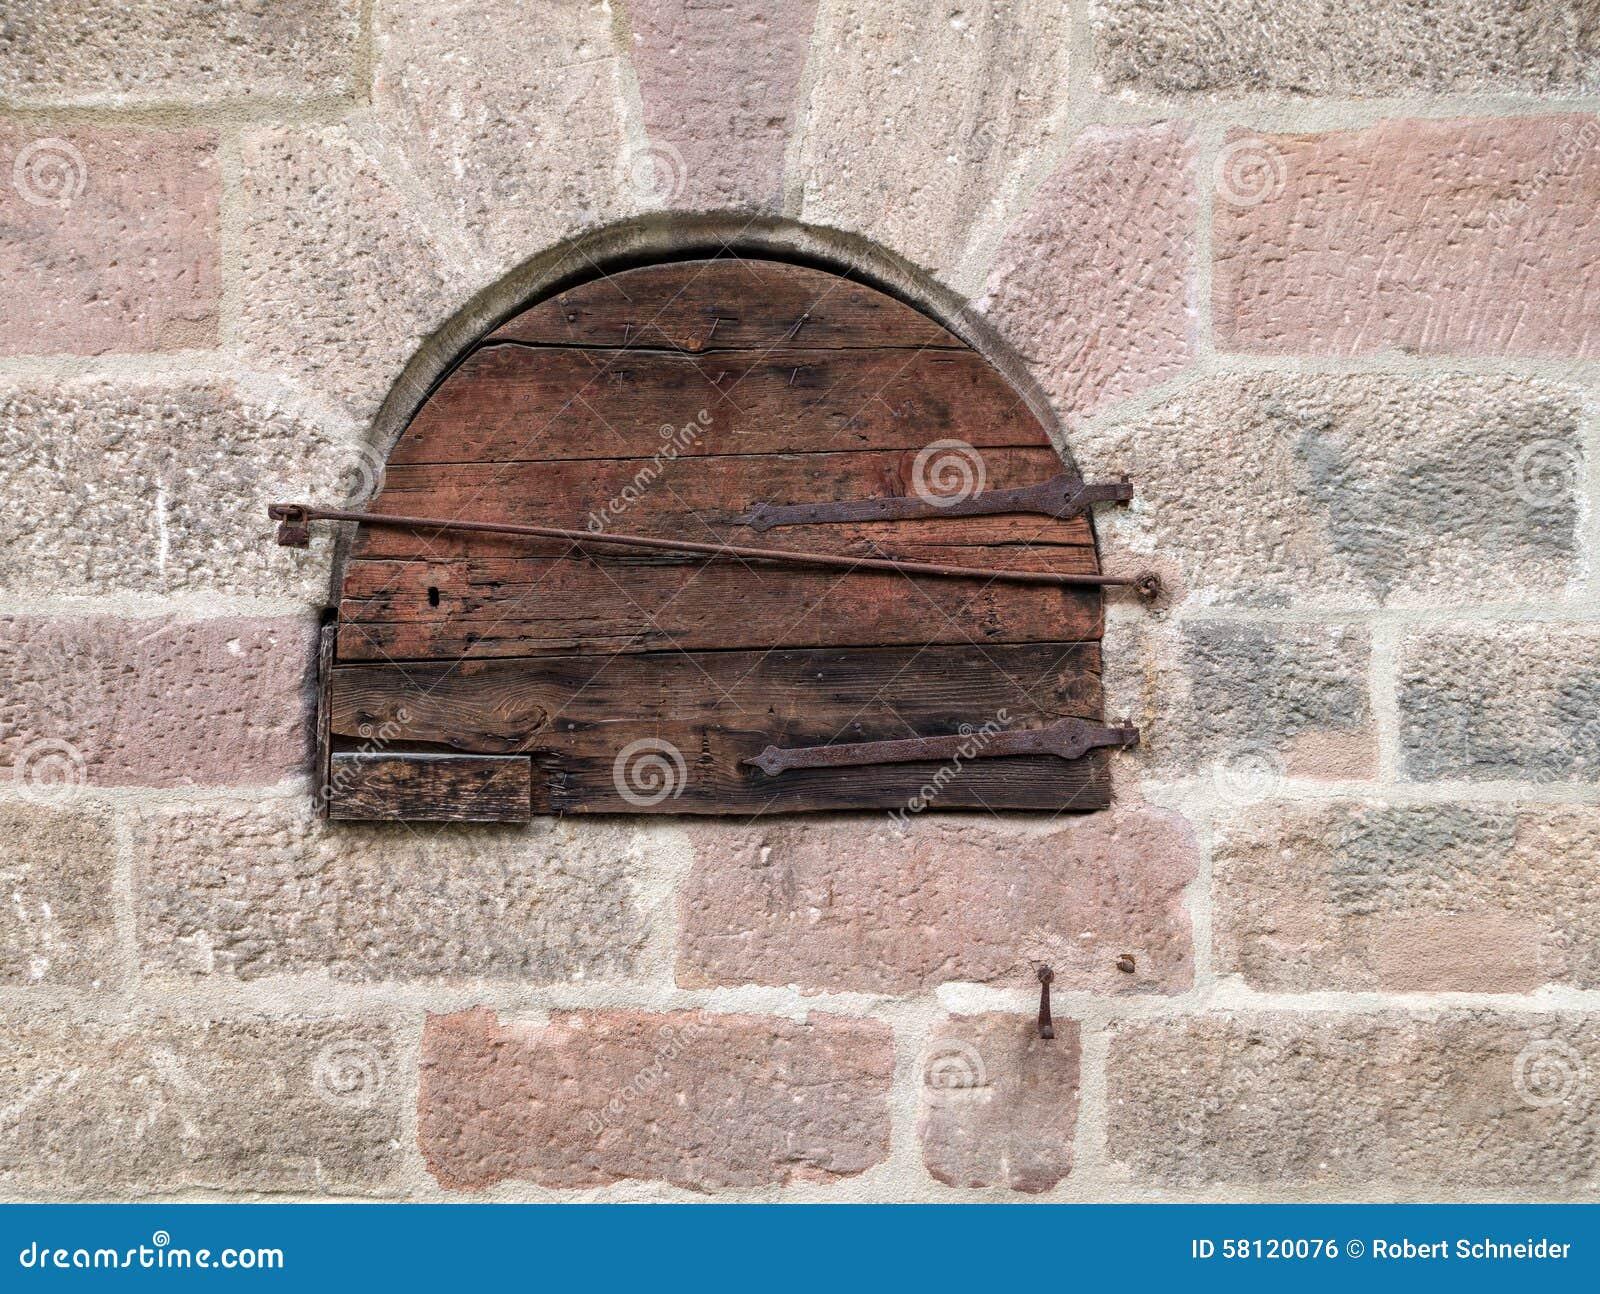 Peque a puerta de madera redonda en una alba iler a vieja for Puerta vieja madera